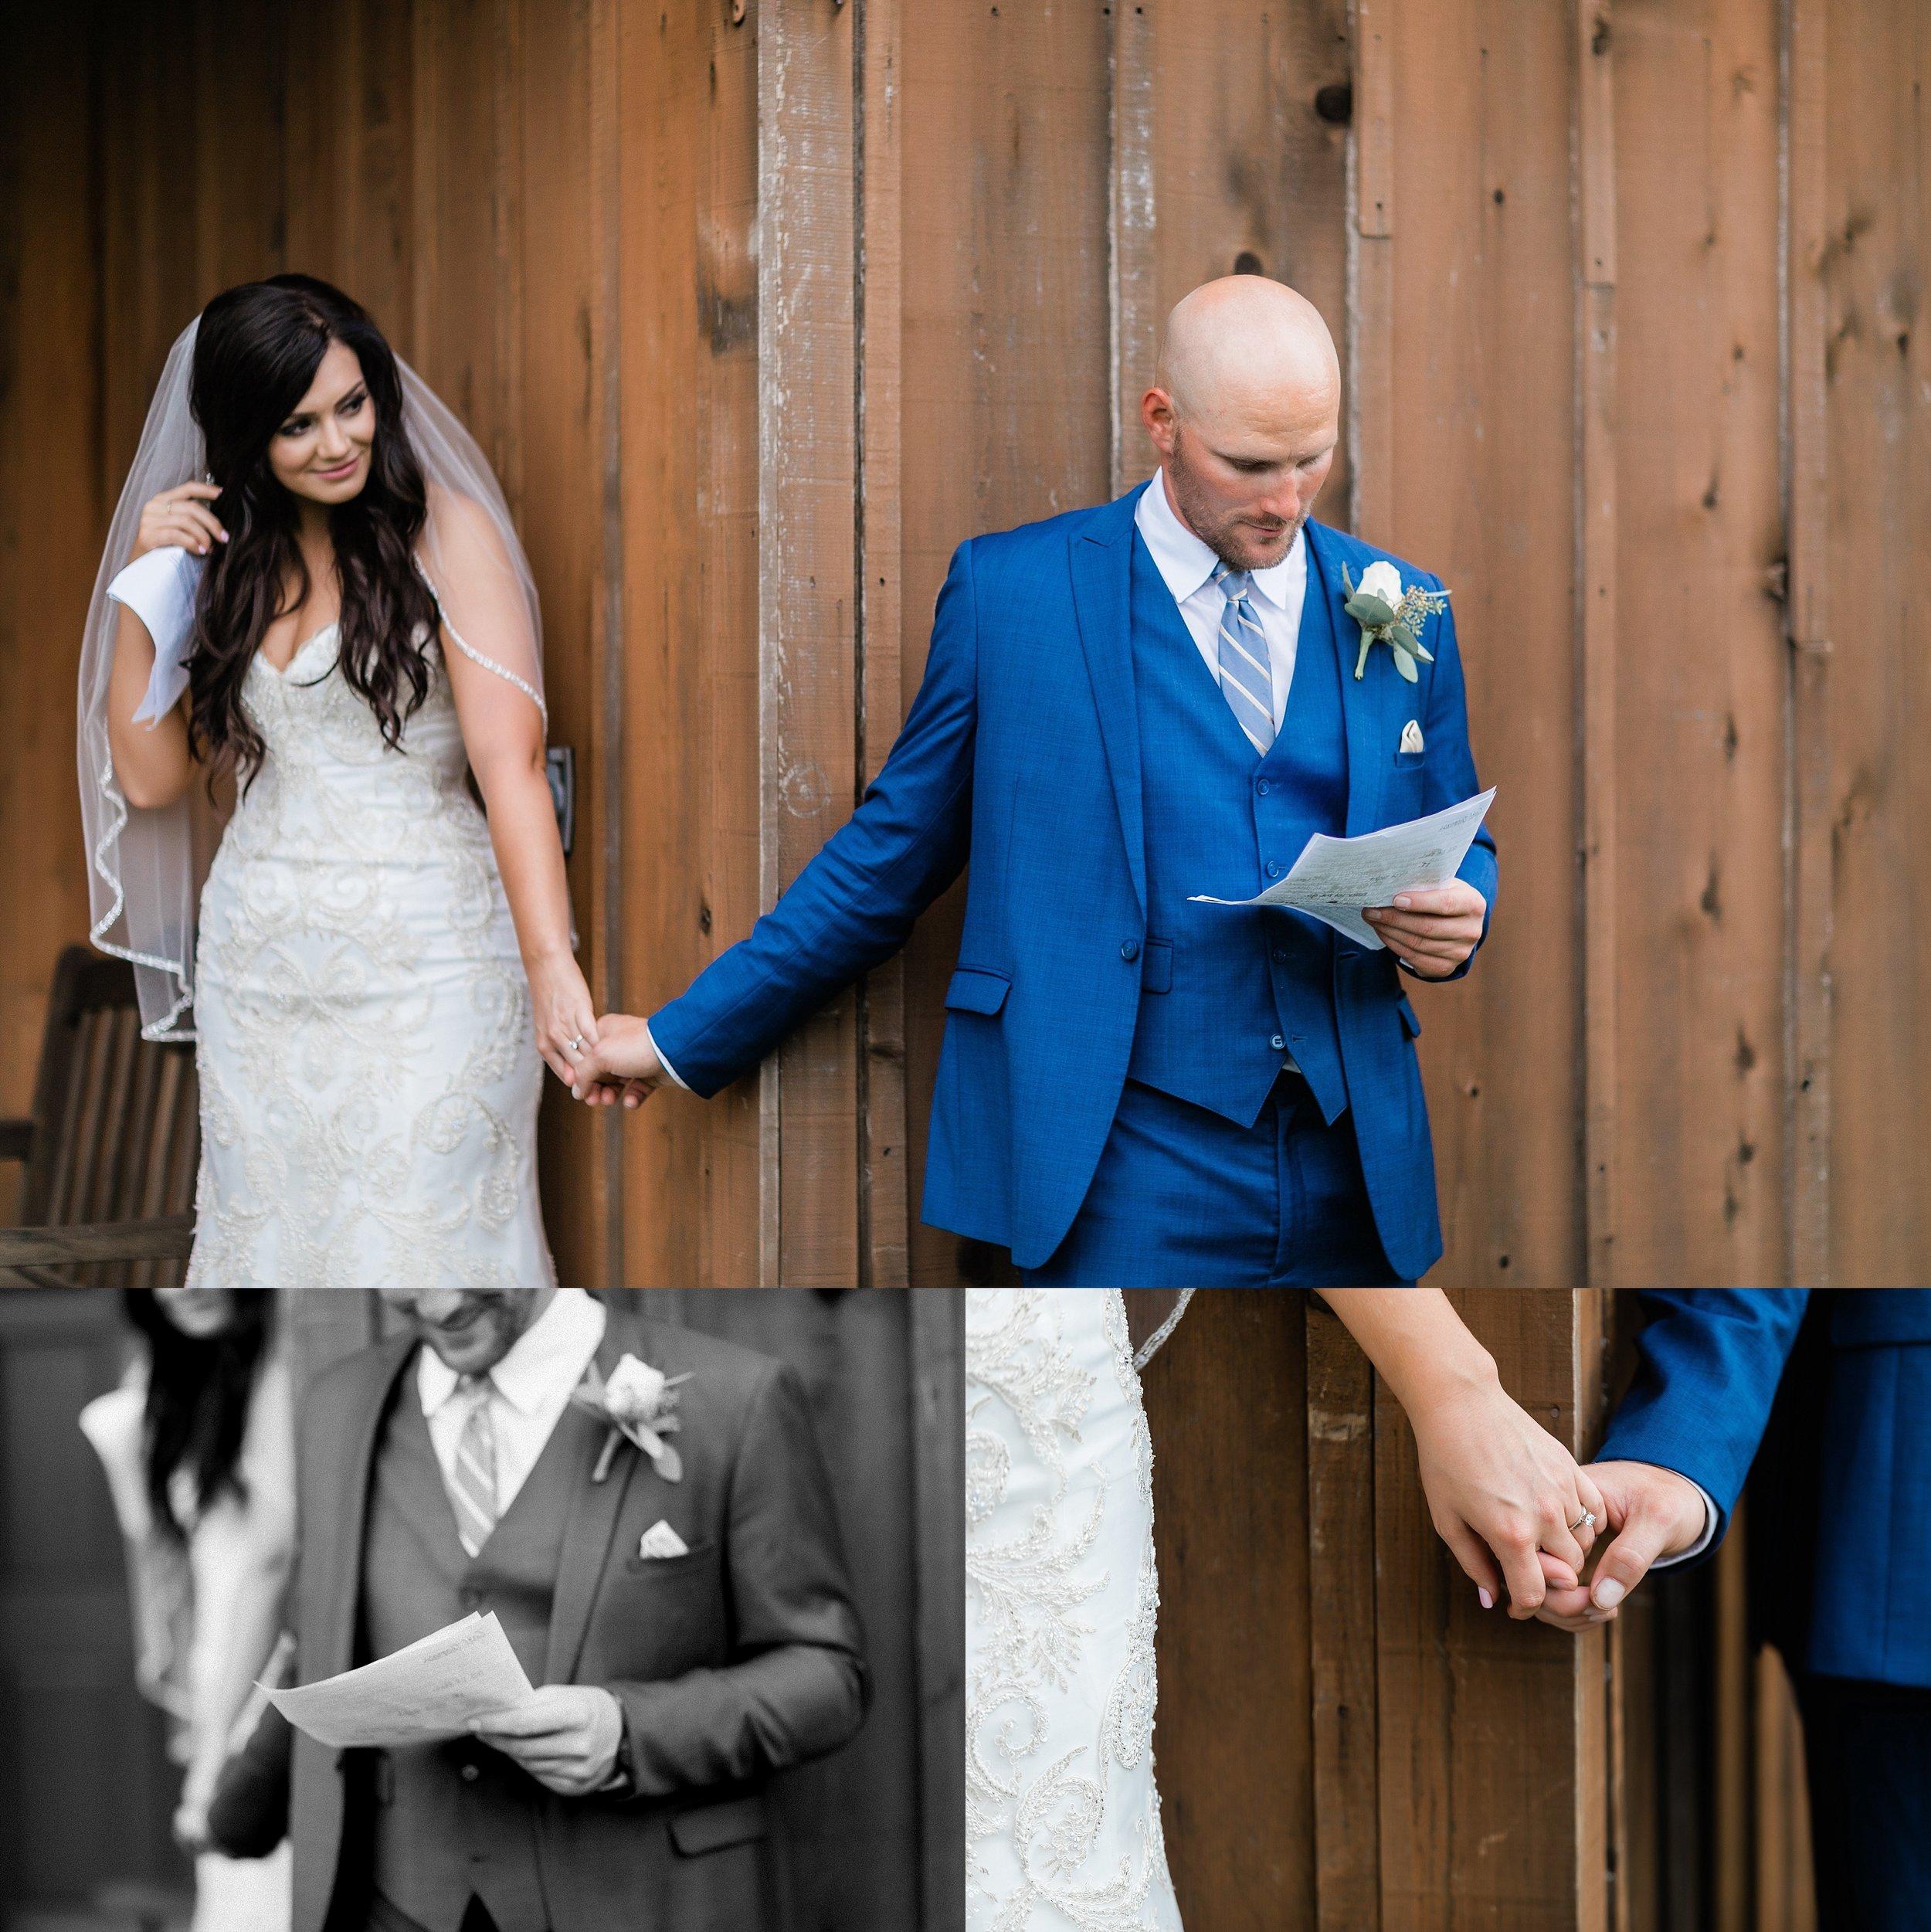 bailey-and-carl-coyote-ranch-resort-wedding-photographer-wichita-falls-texas-destination-wedding-0010.jpg